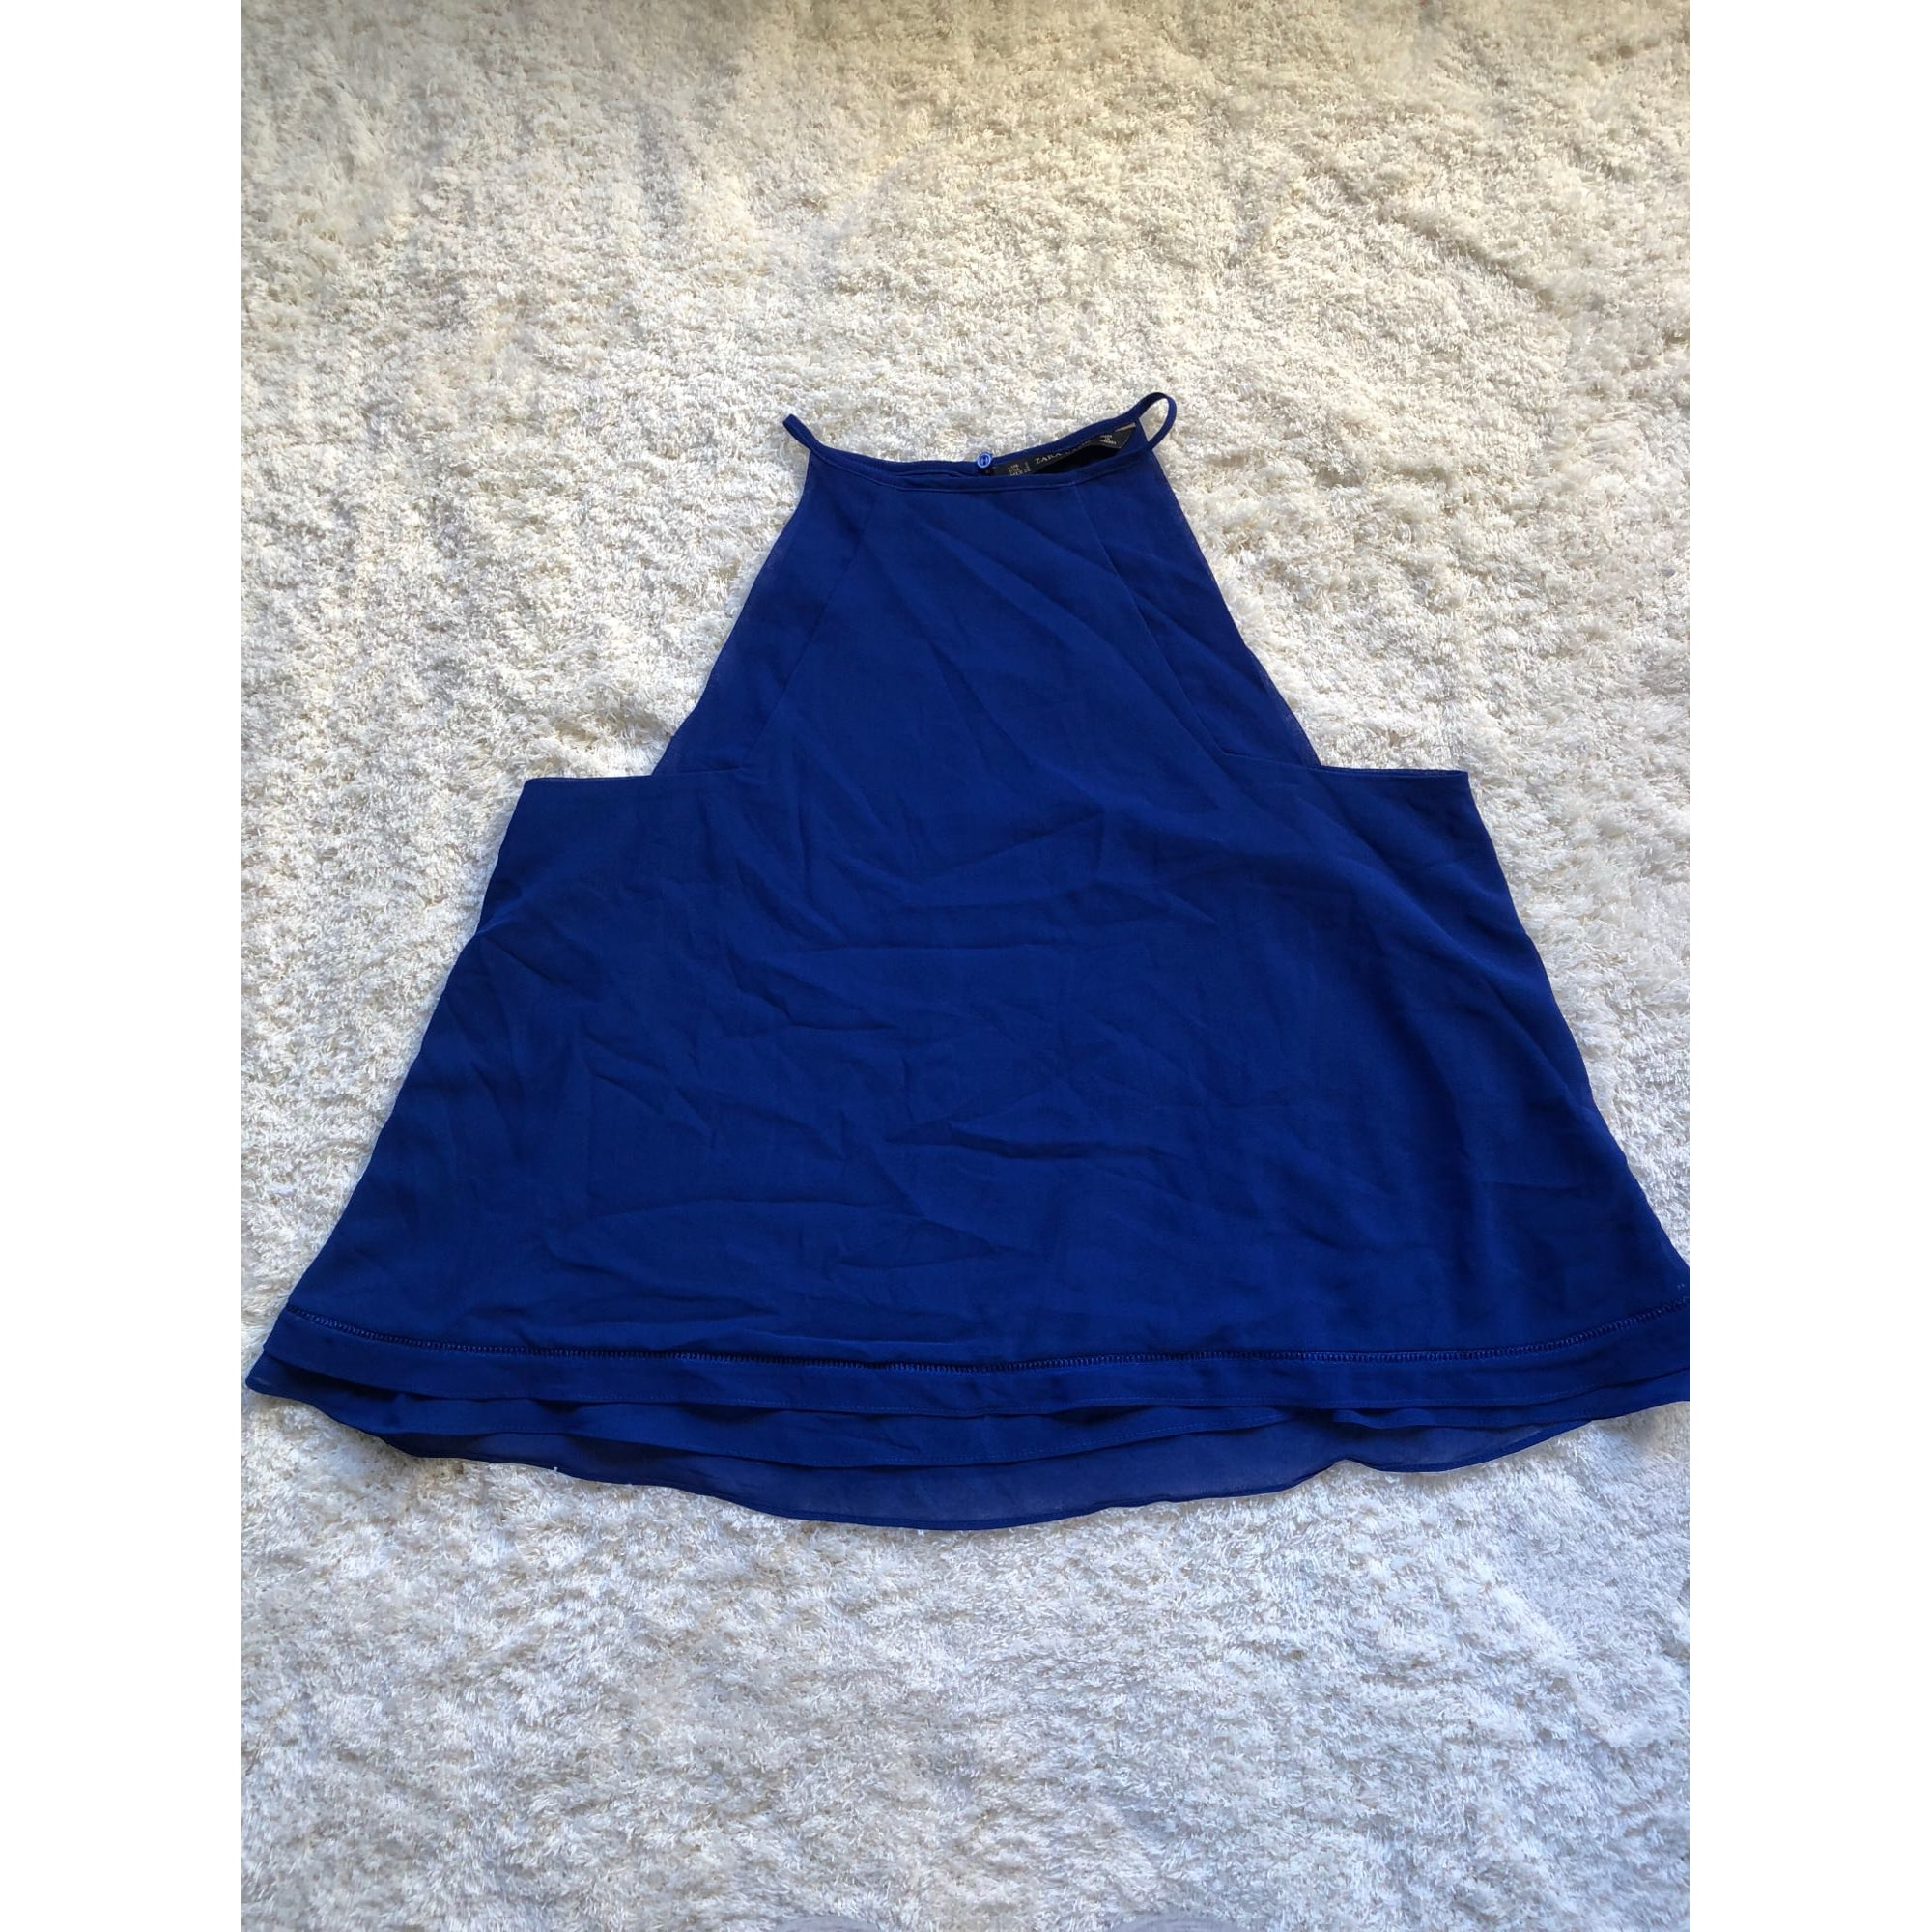 Débardeur ZARA Bleu, bleu marine, bleu turquoise